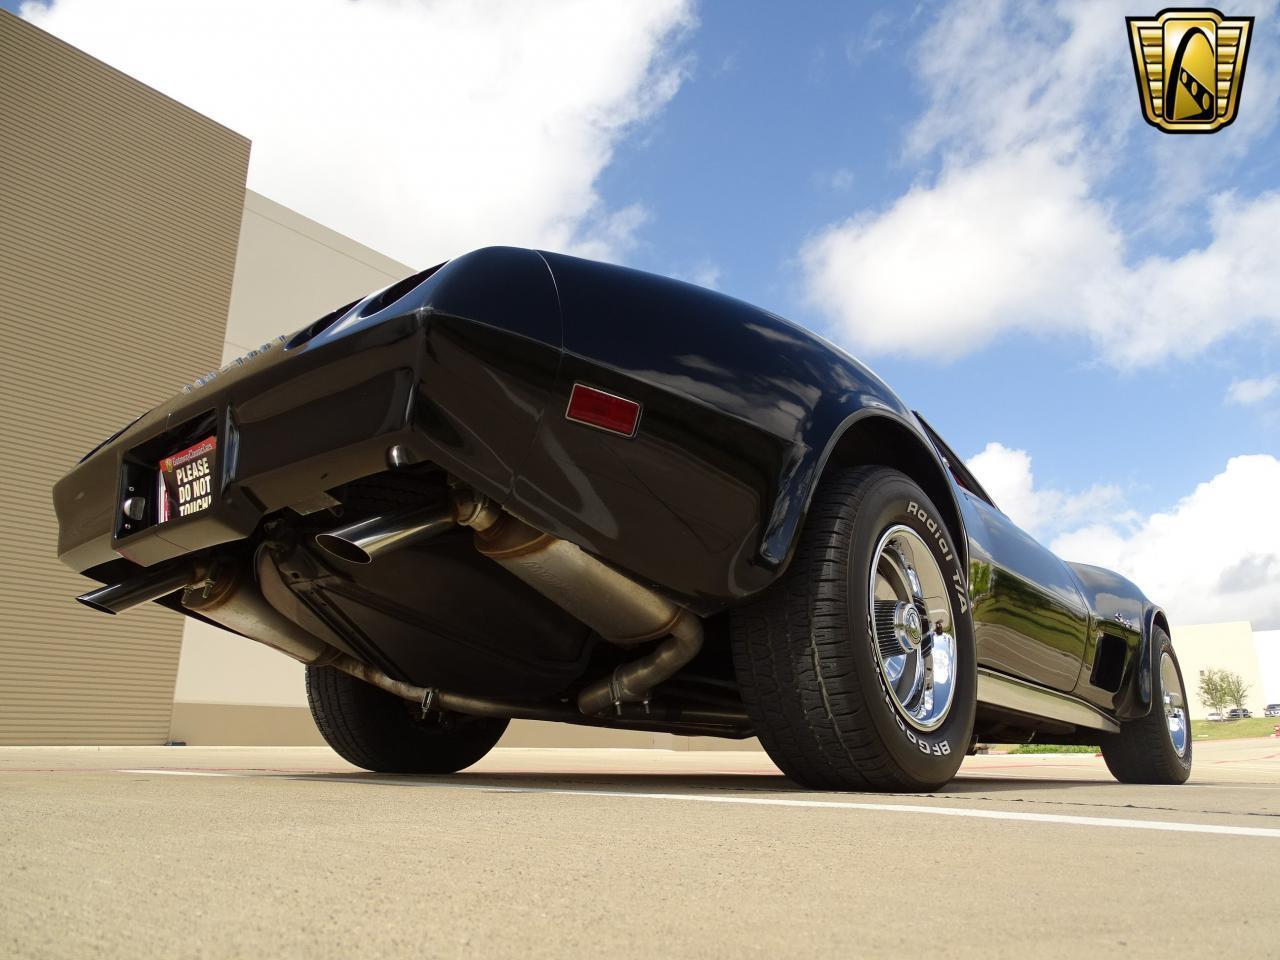 Large Picture of '74 Chevrolet Corvette located in DFW Airport Texas - LAOQ